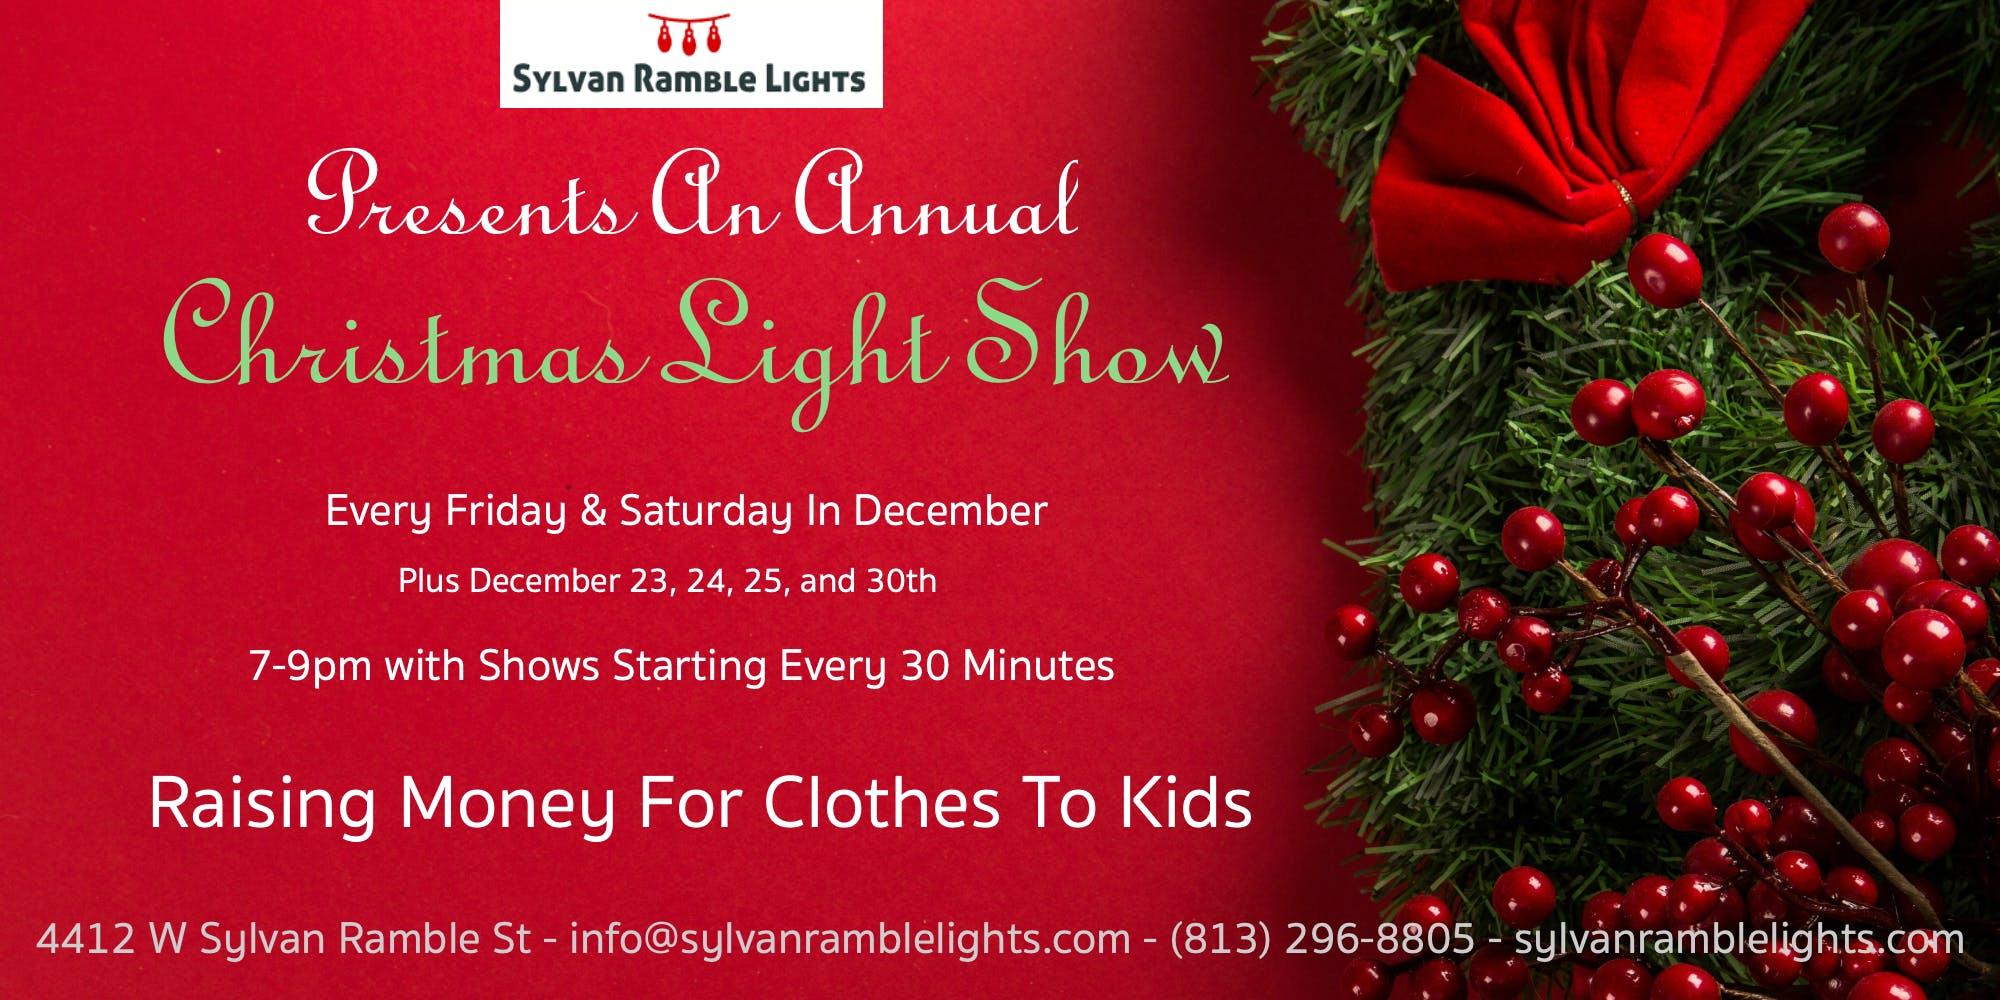 Sylvan Ramble Lights - Christmas Light Show - 8 DEC 2018